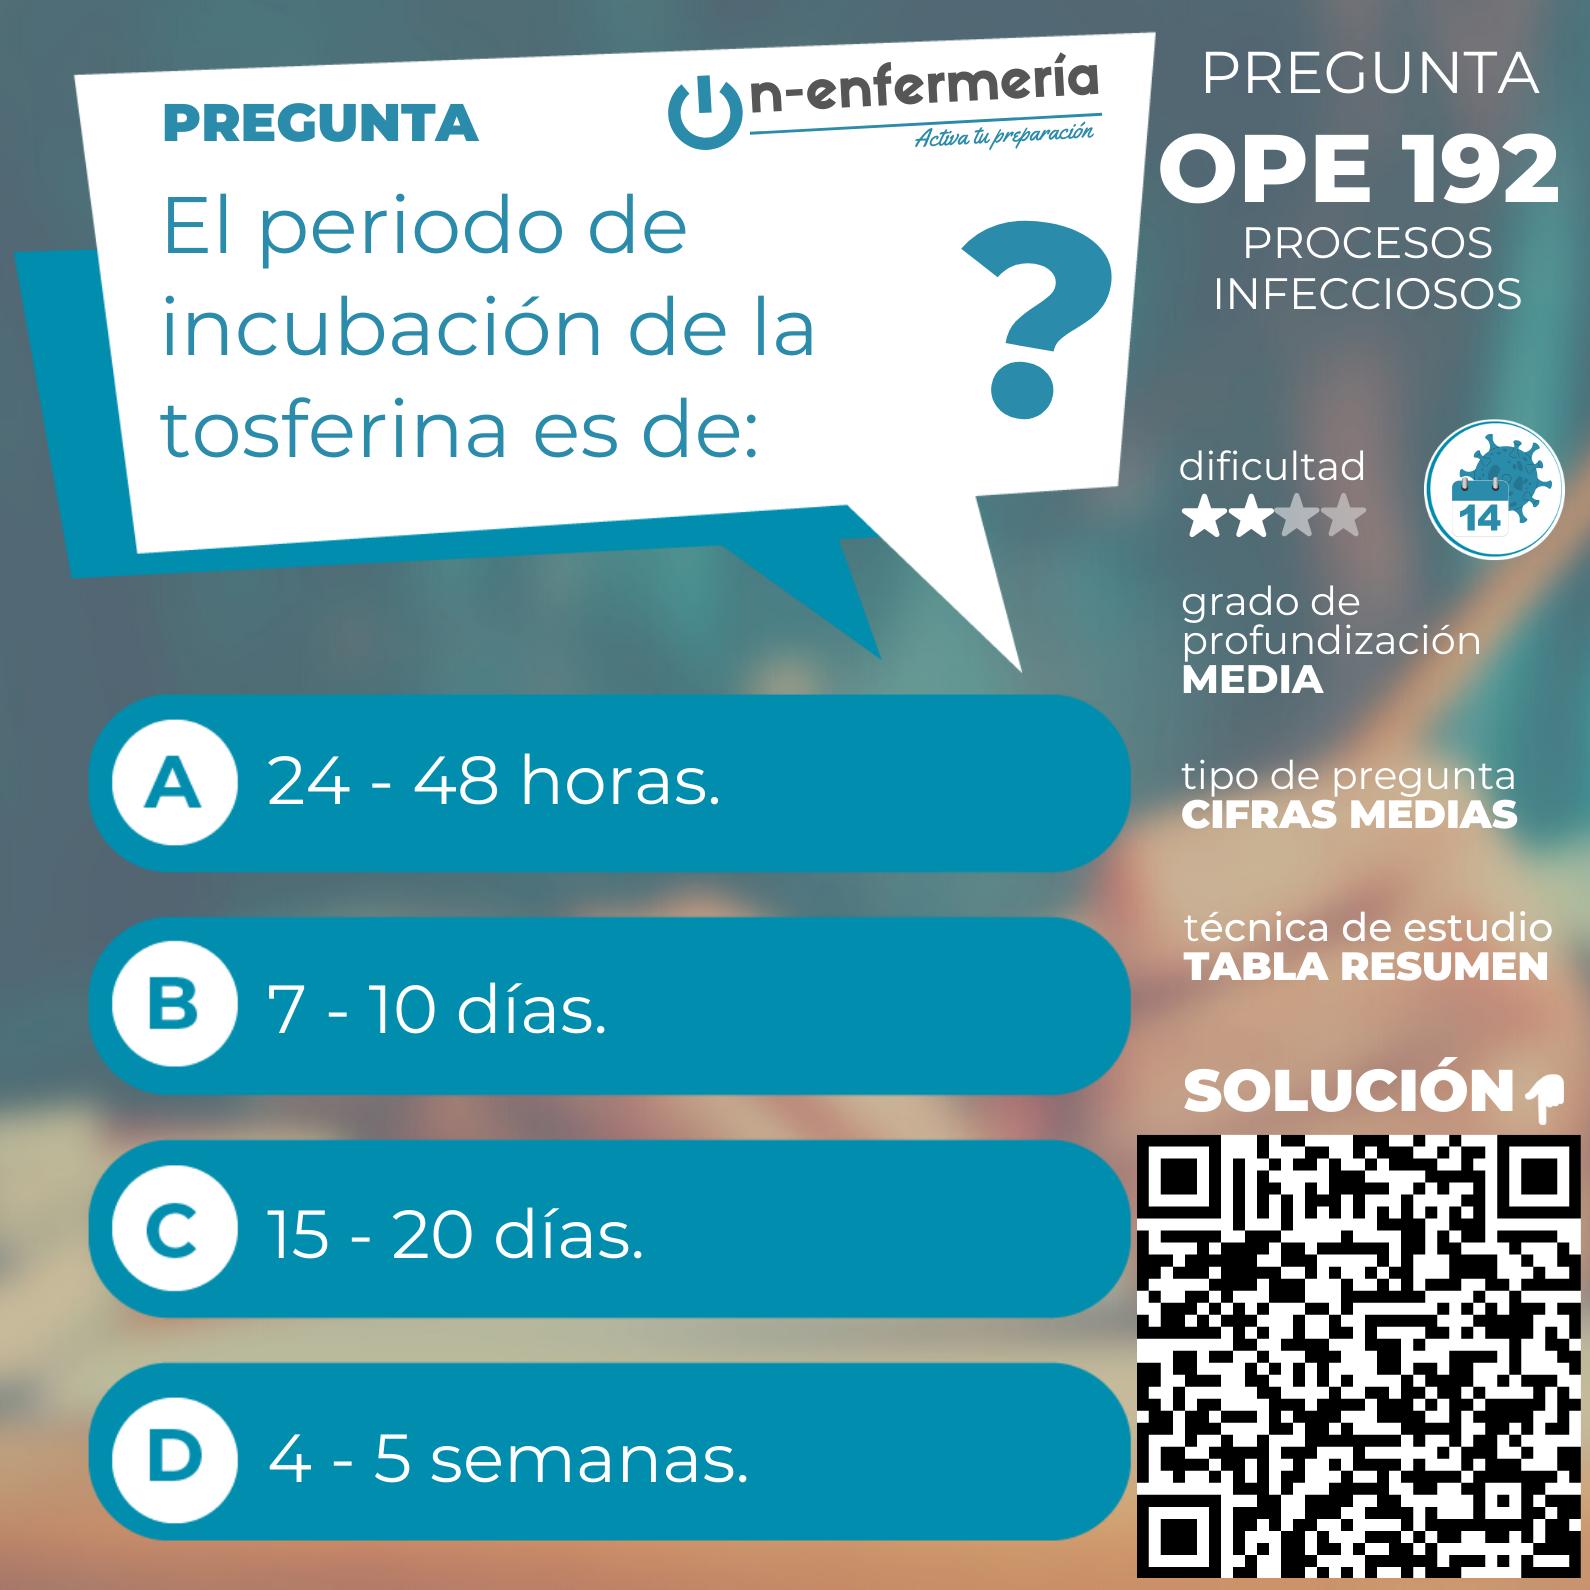 Pregunta examen OPE Enfermería nº 192 - Procesos infecciosos